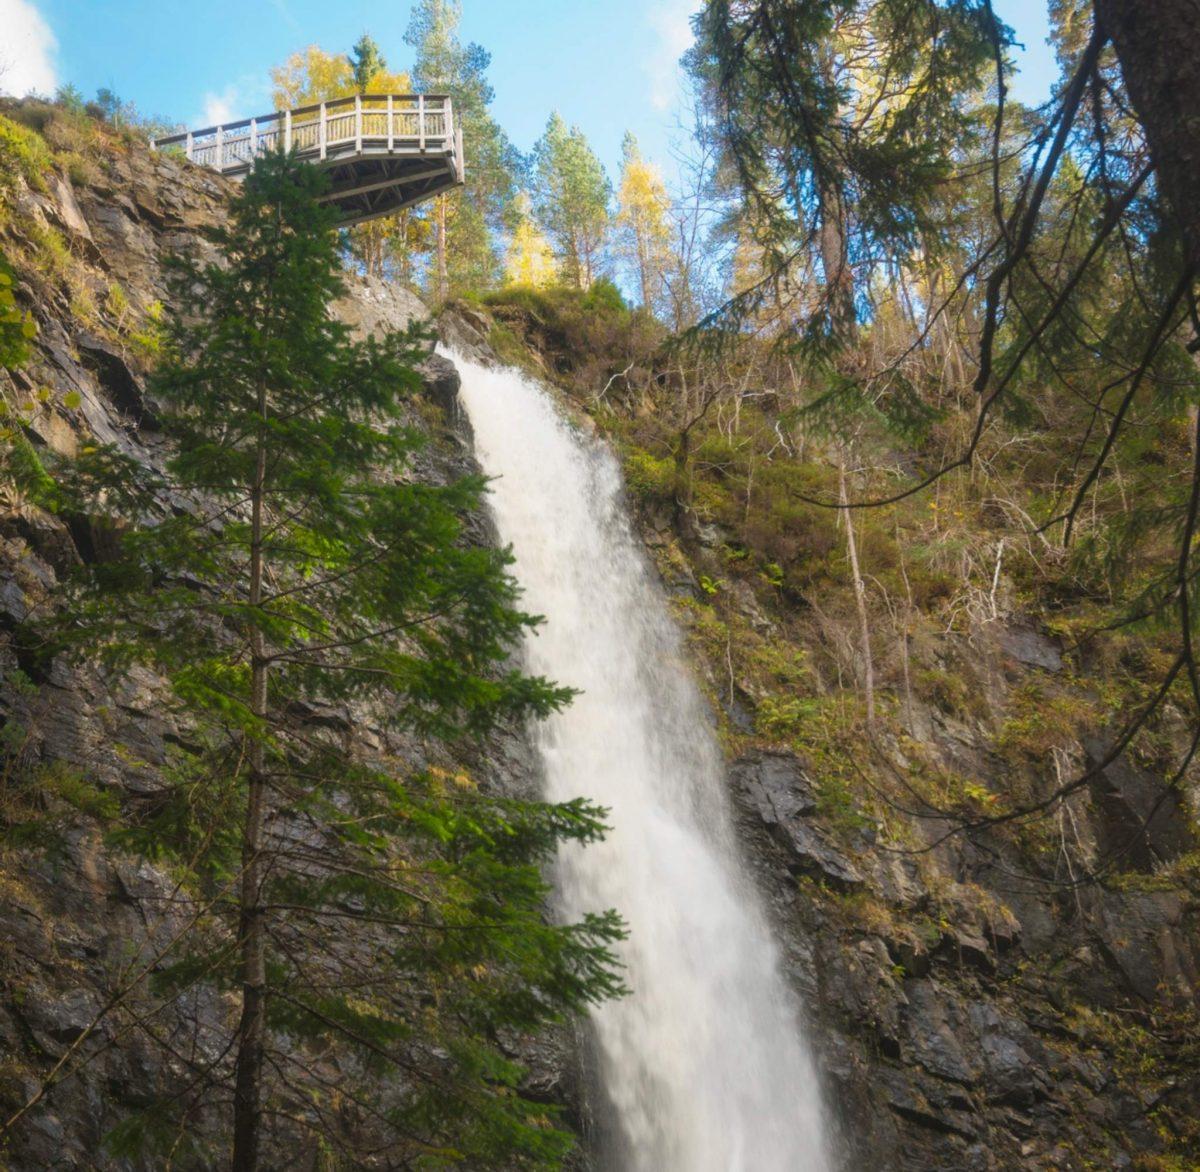 Plodda Falls, Glen Affric, Highlands